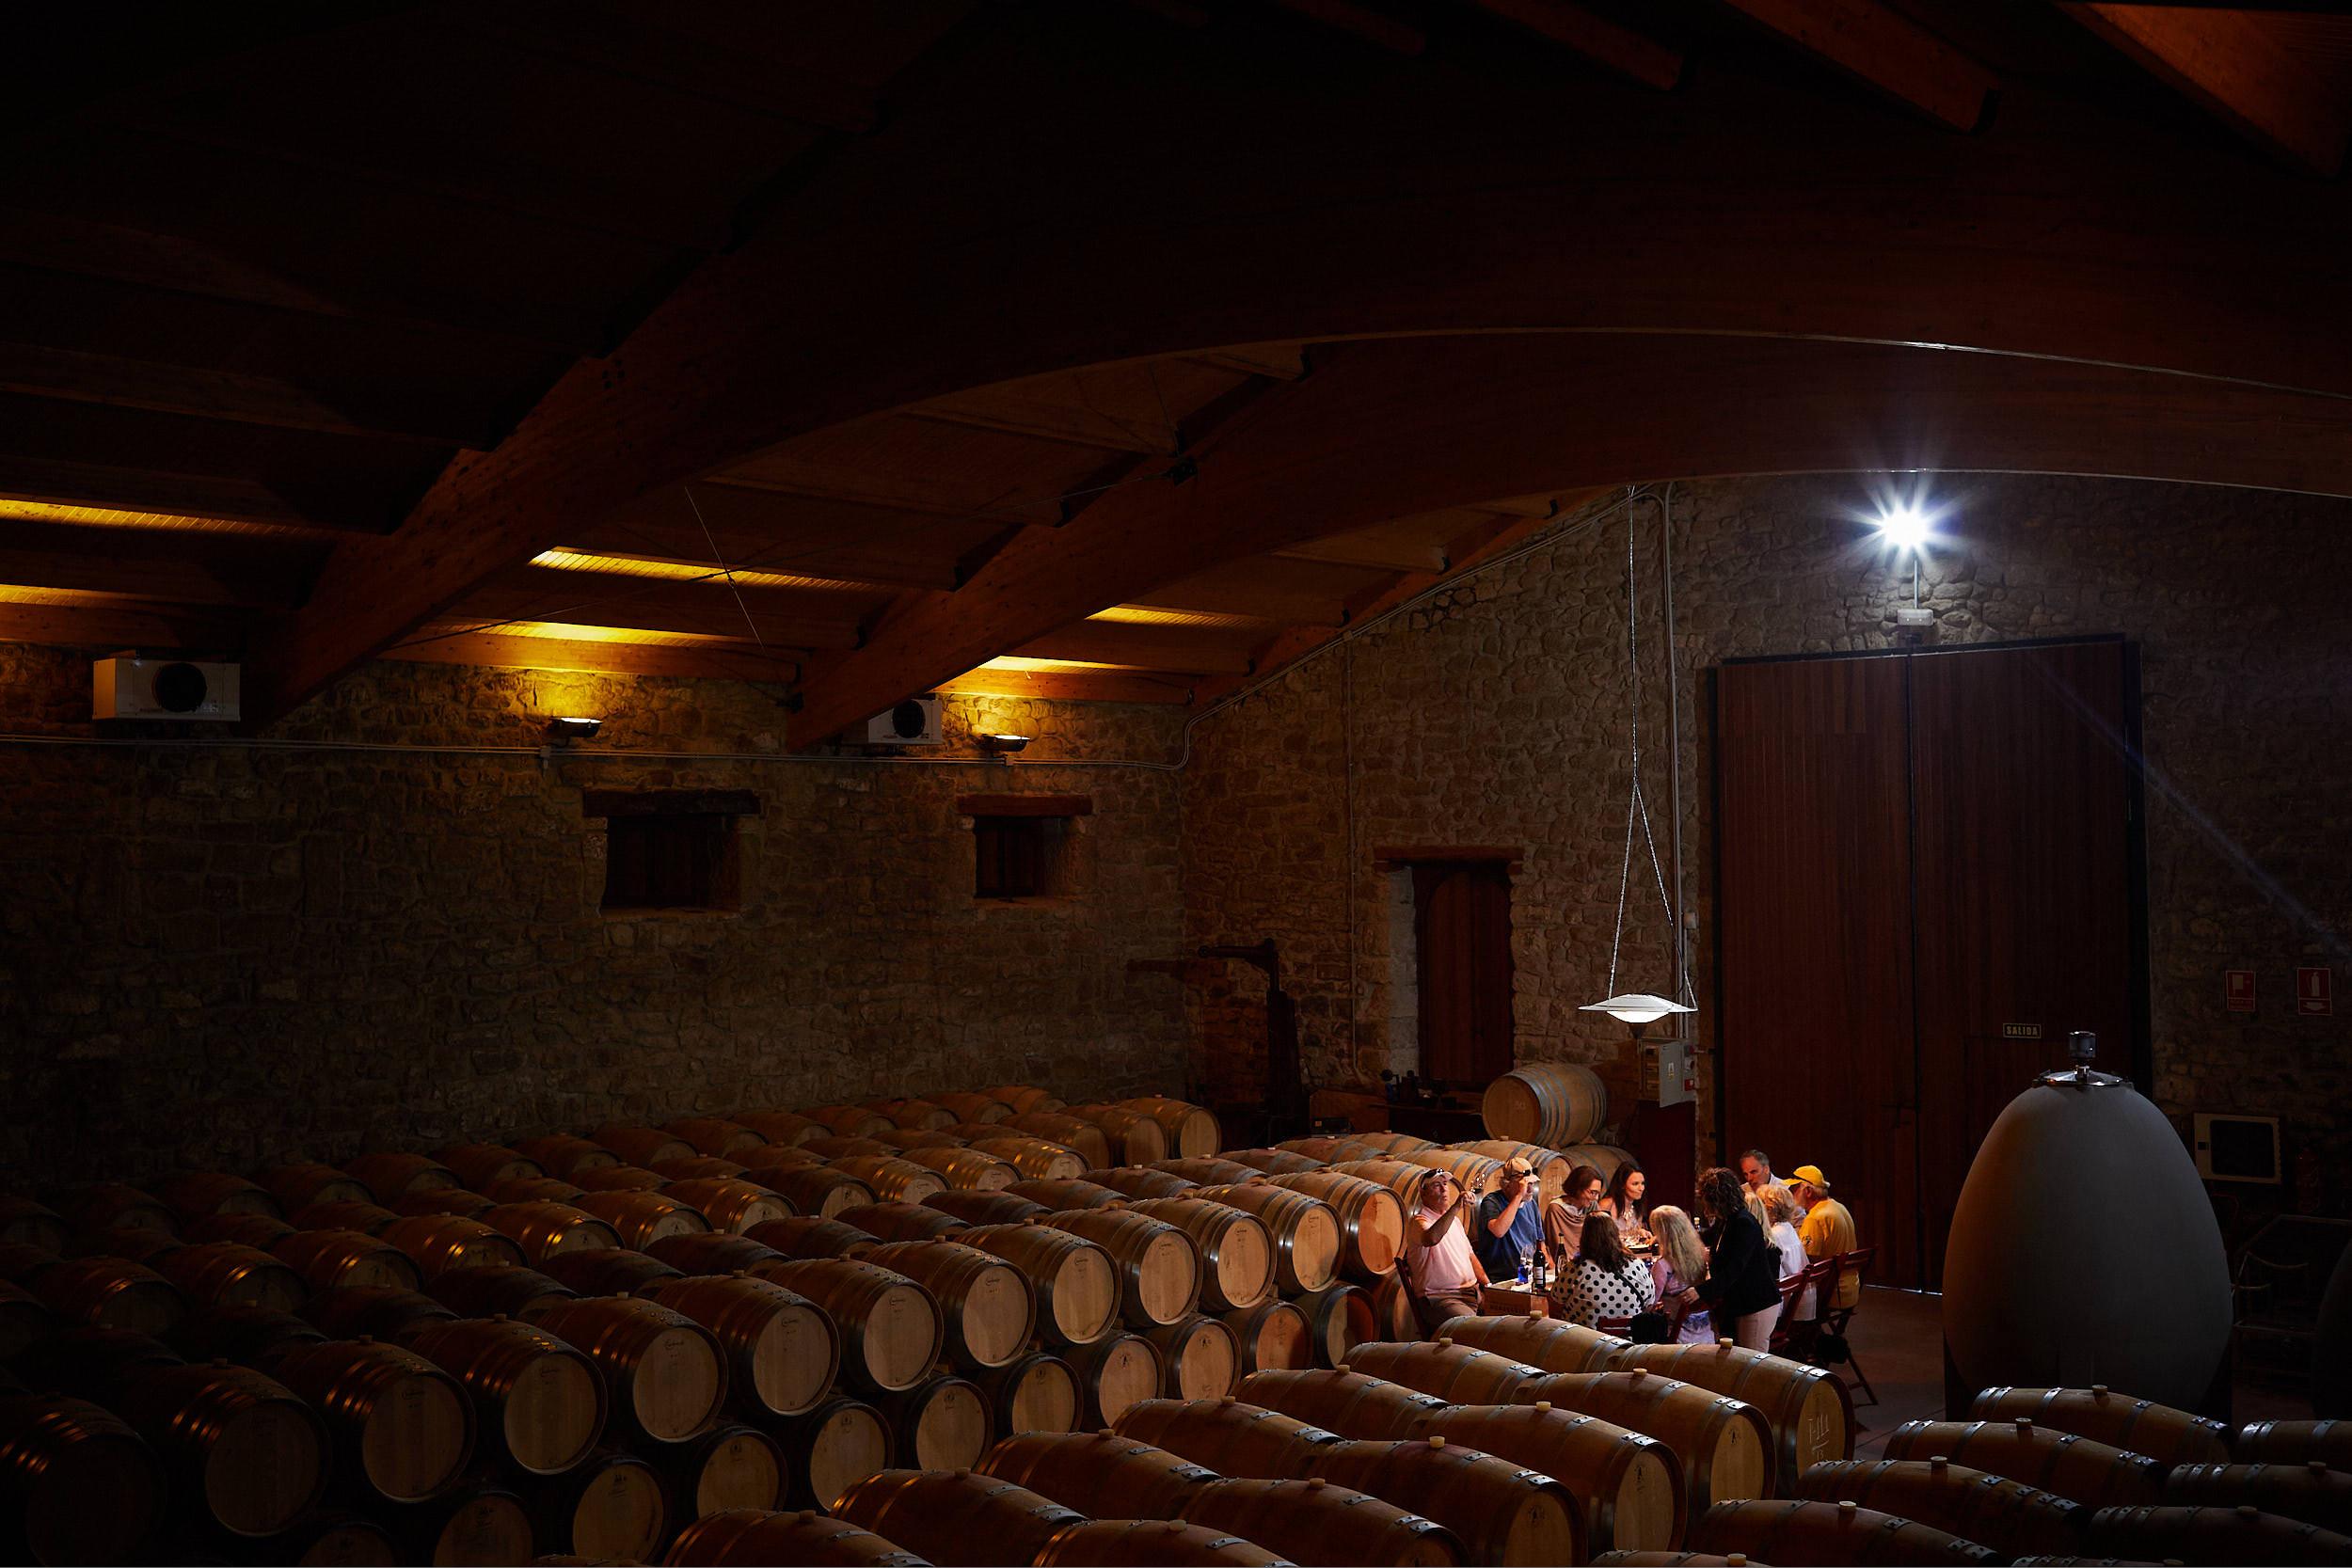 1809fotografia-profesional-corporativa-vino-rioja-espana-James-Sturcke_0039.jpg